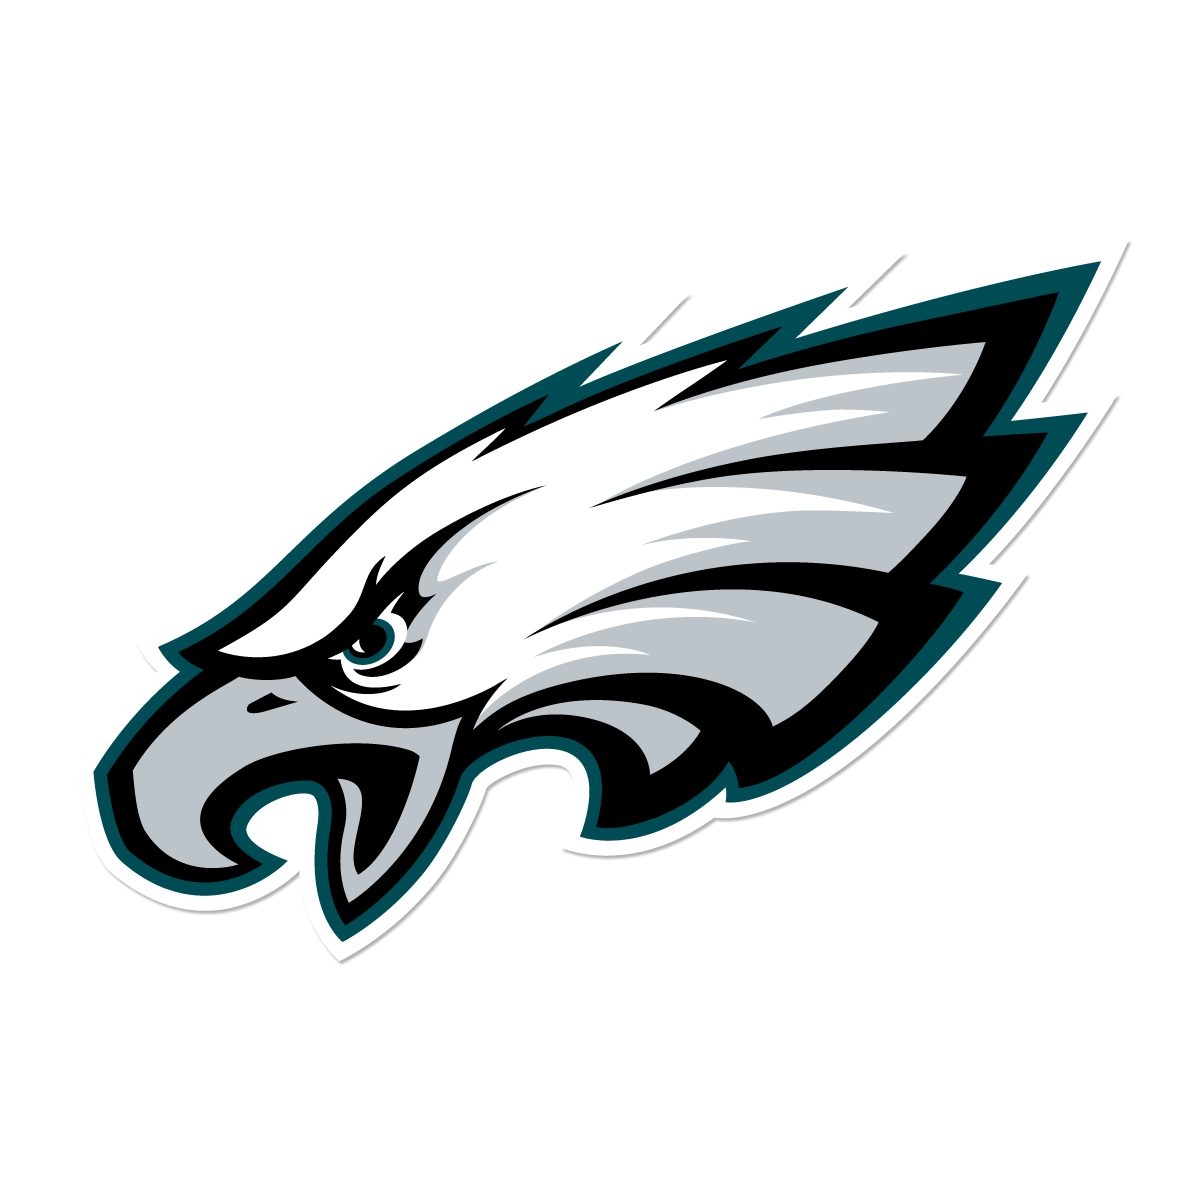 hight resolution of philadelphia eagles eagles vs falcons nfl logos